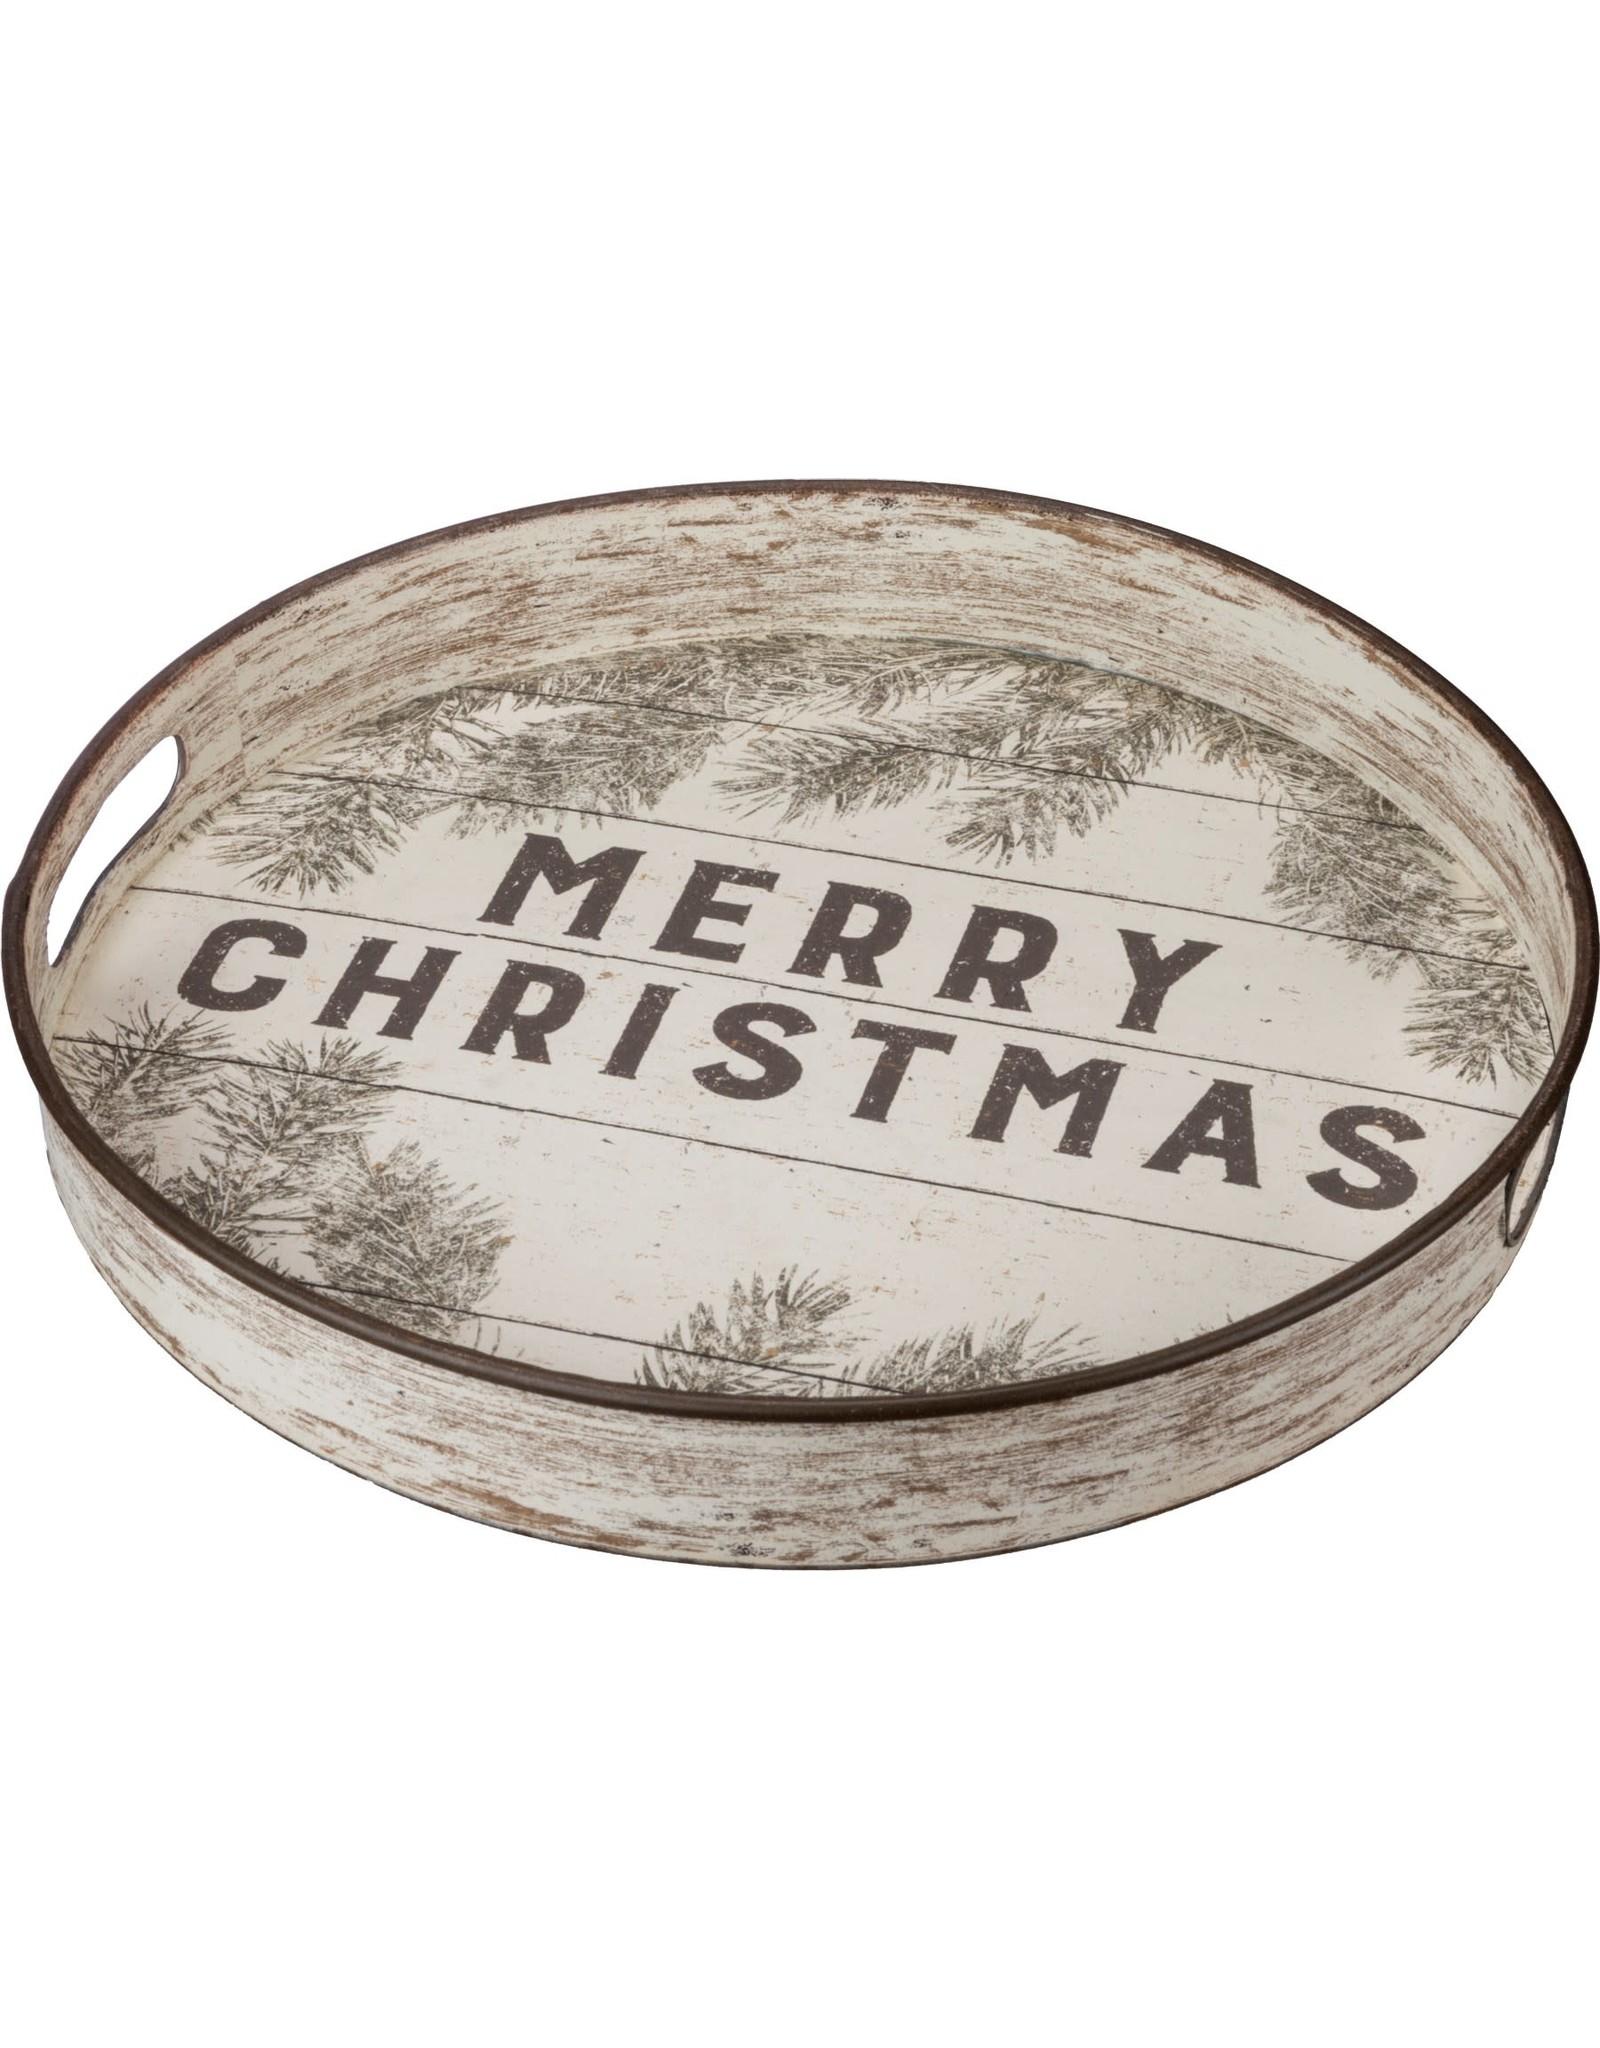 Merry Christmas Tray